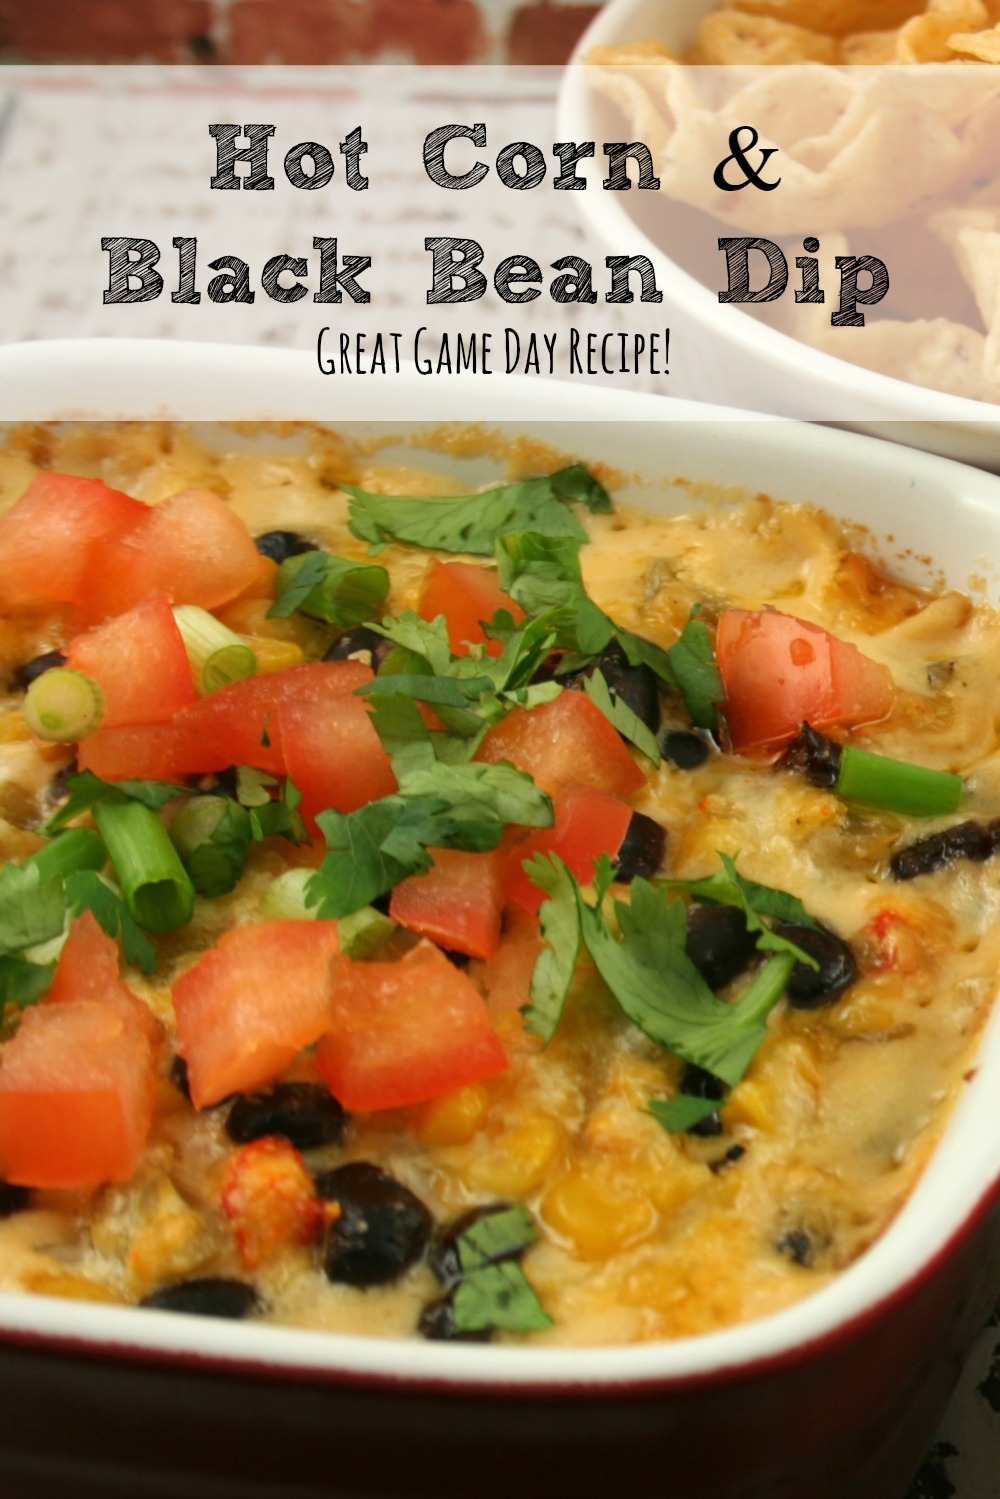 Hot Corn and Black Bean Dip Recipe - Great Game Day Recipe